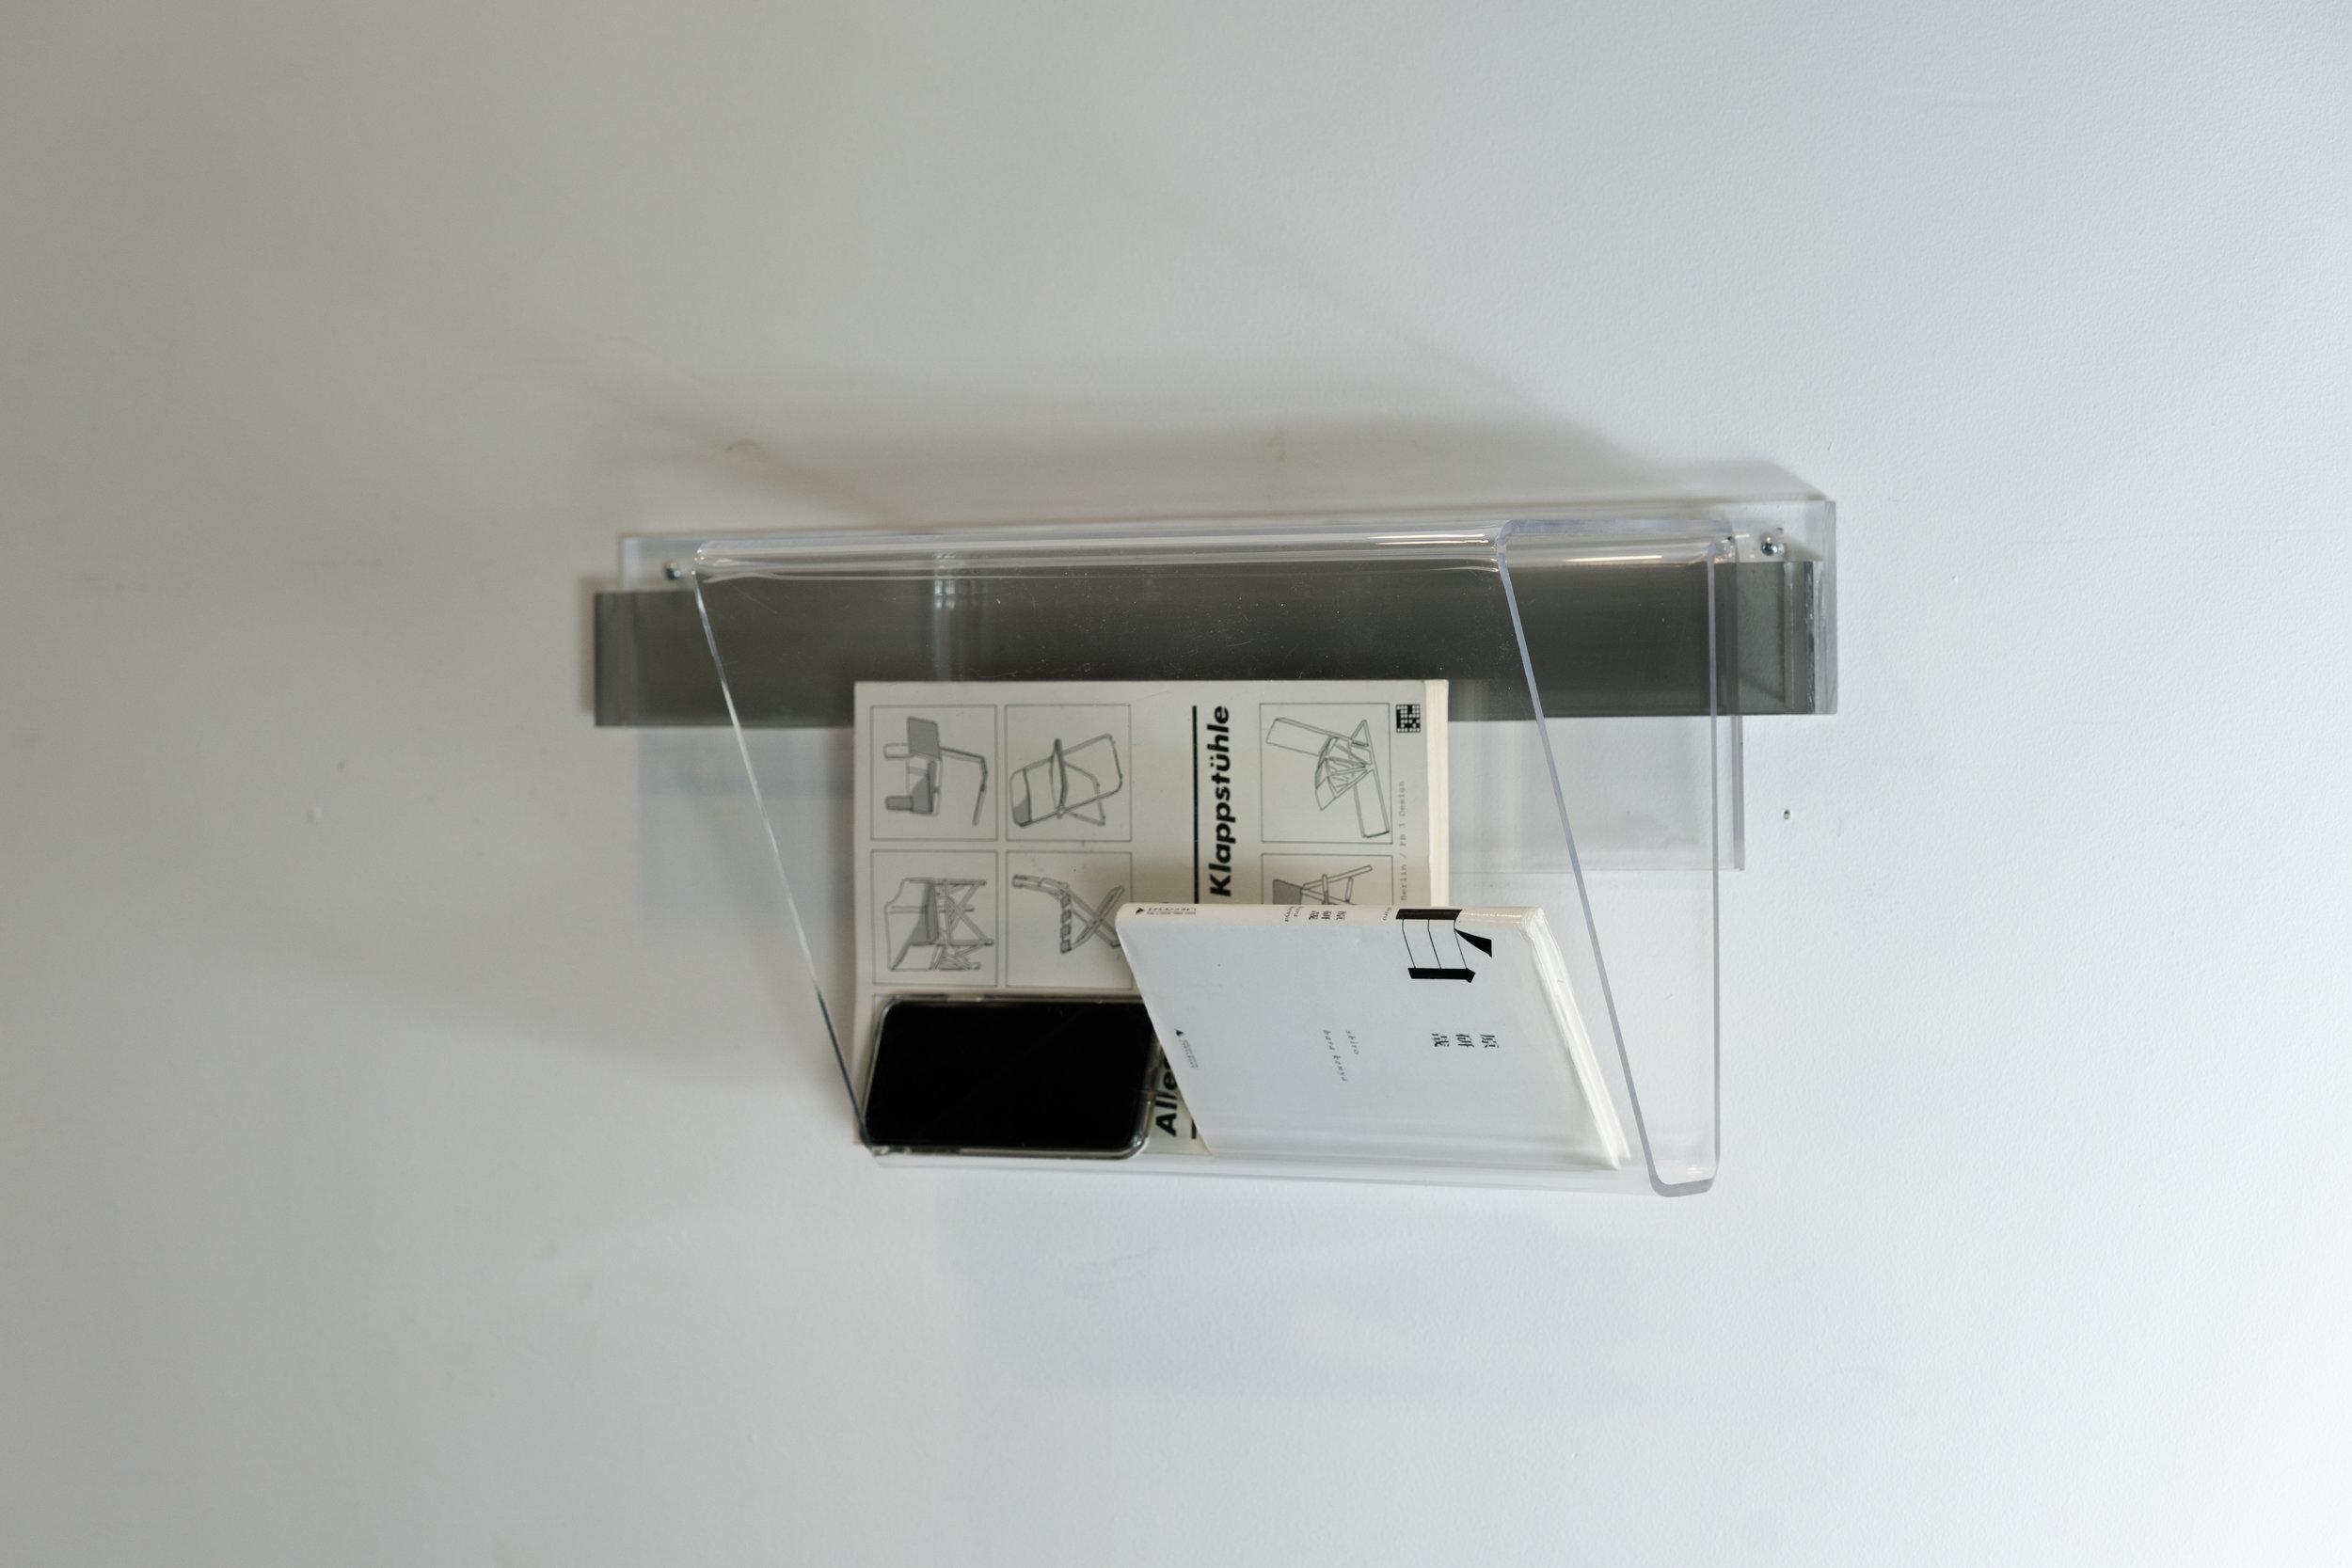 DSC06893-3.JPG